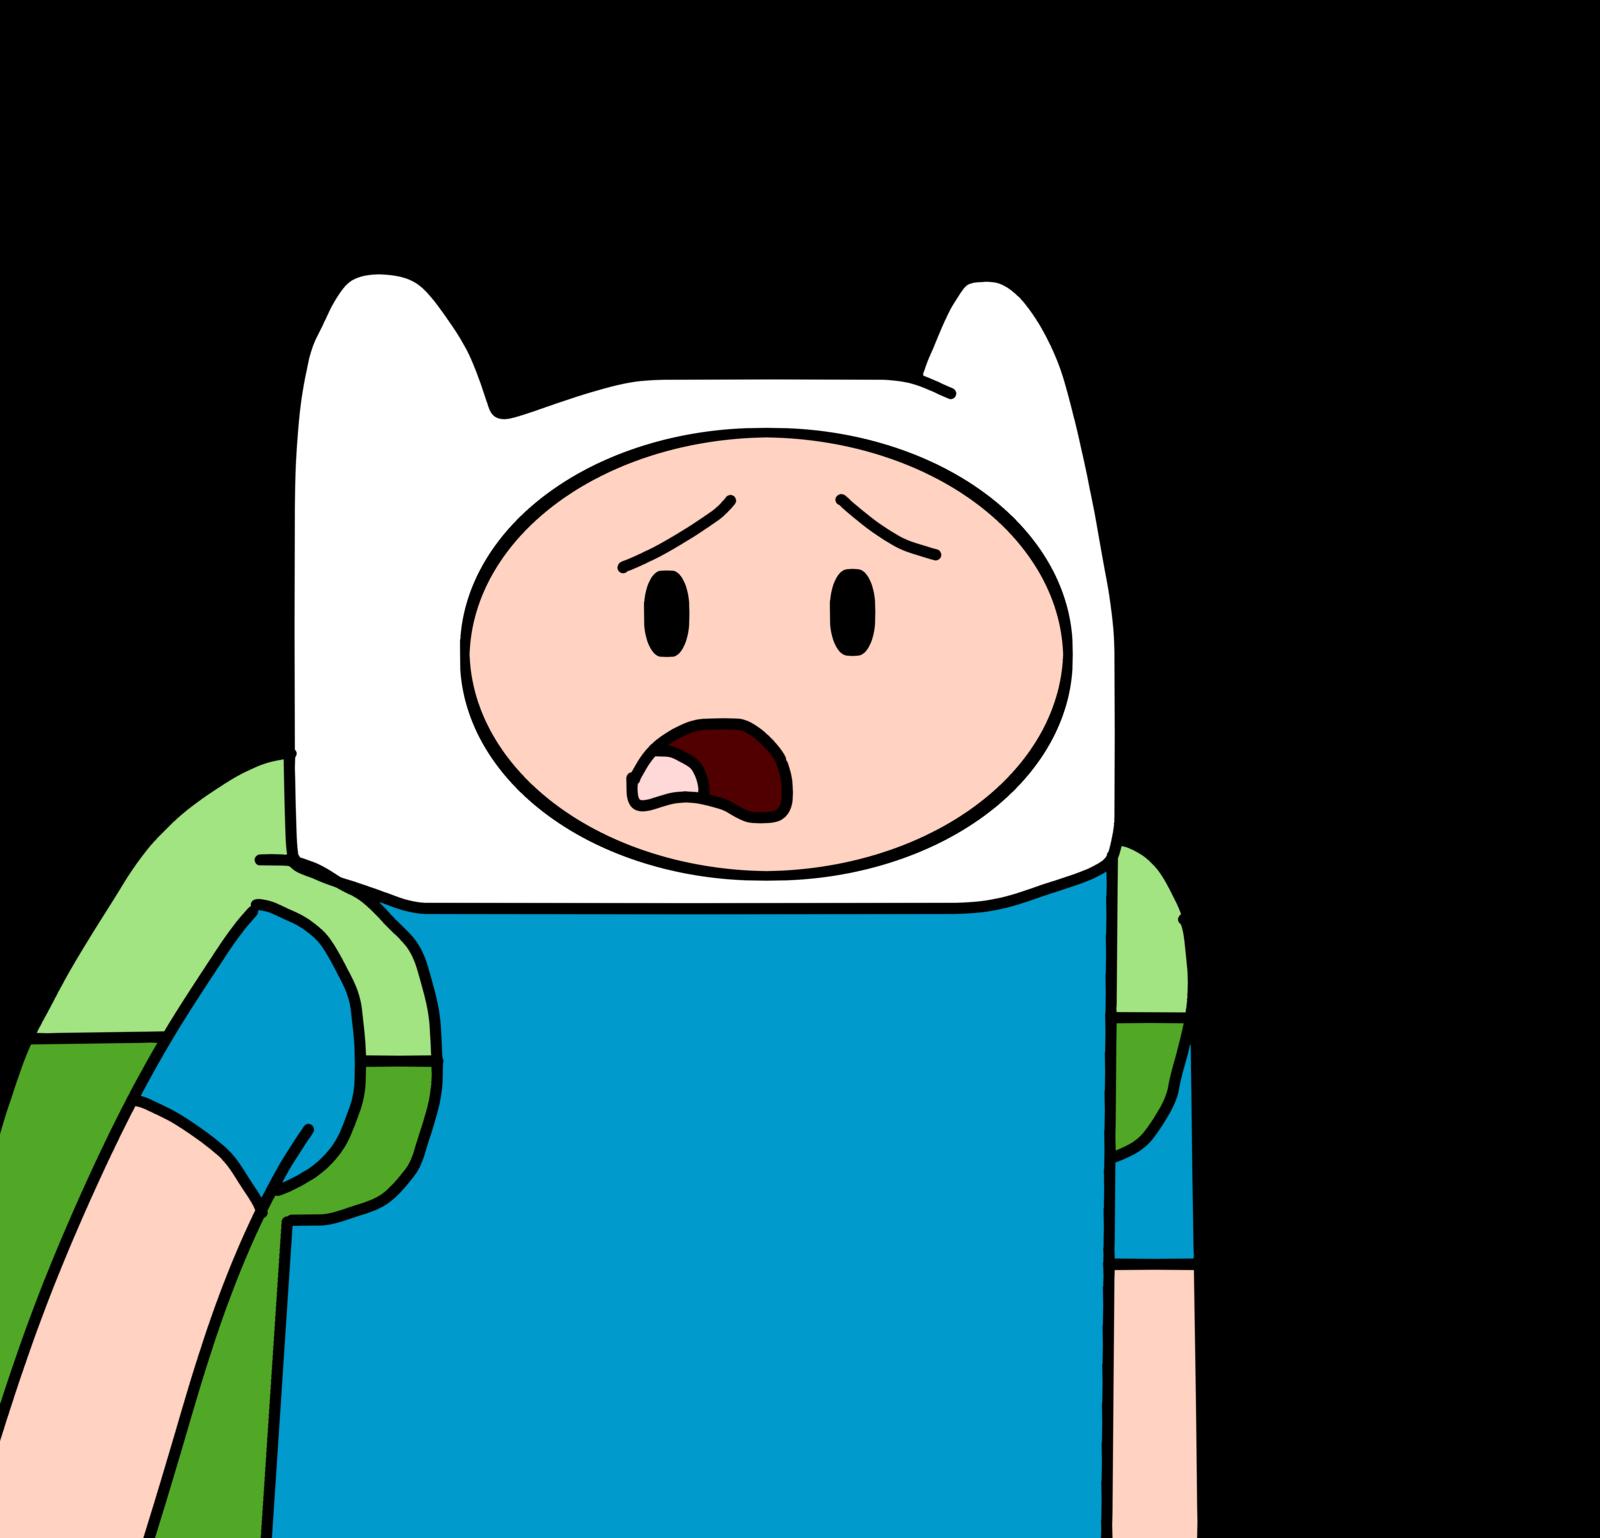 Television clipart watch movie. Finn talks about adventure